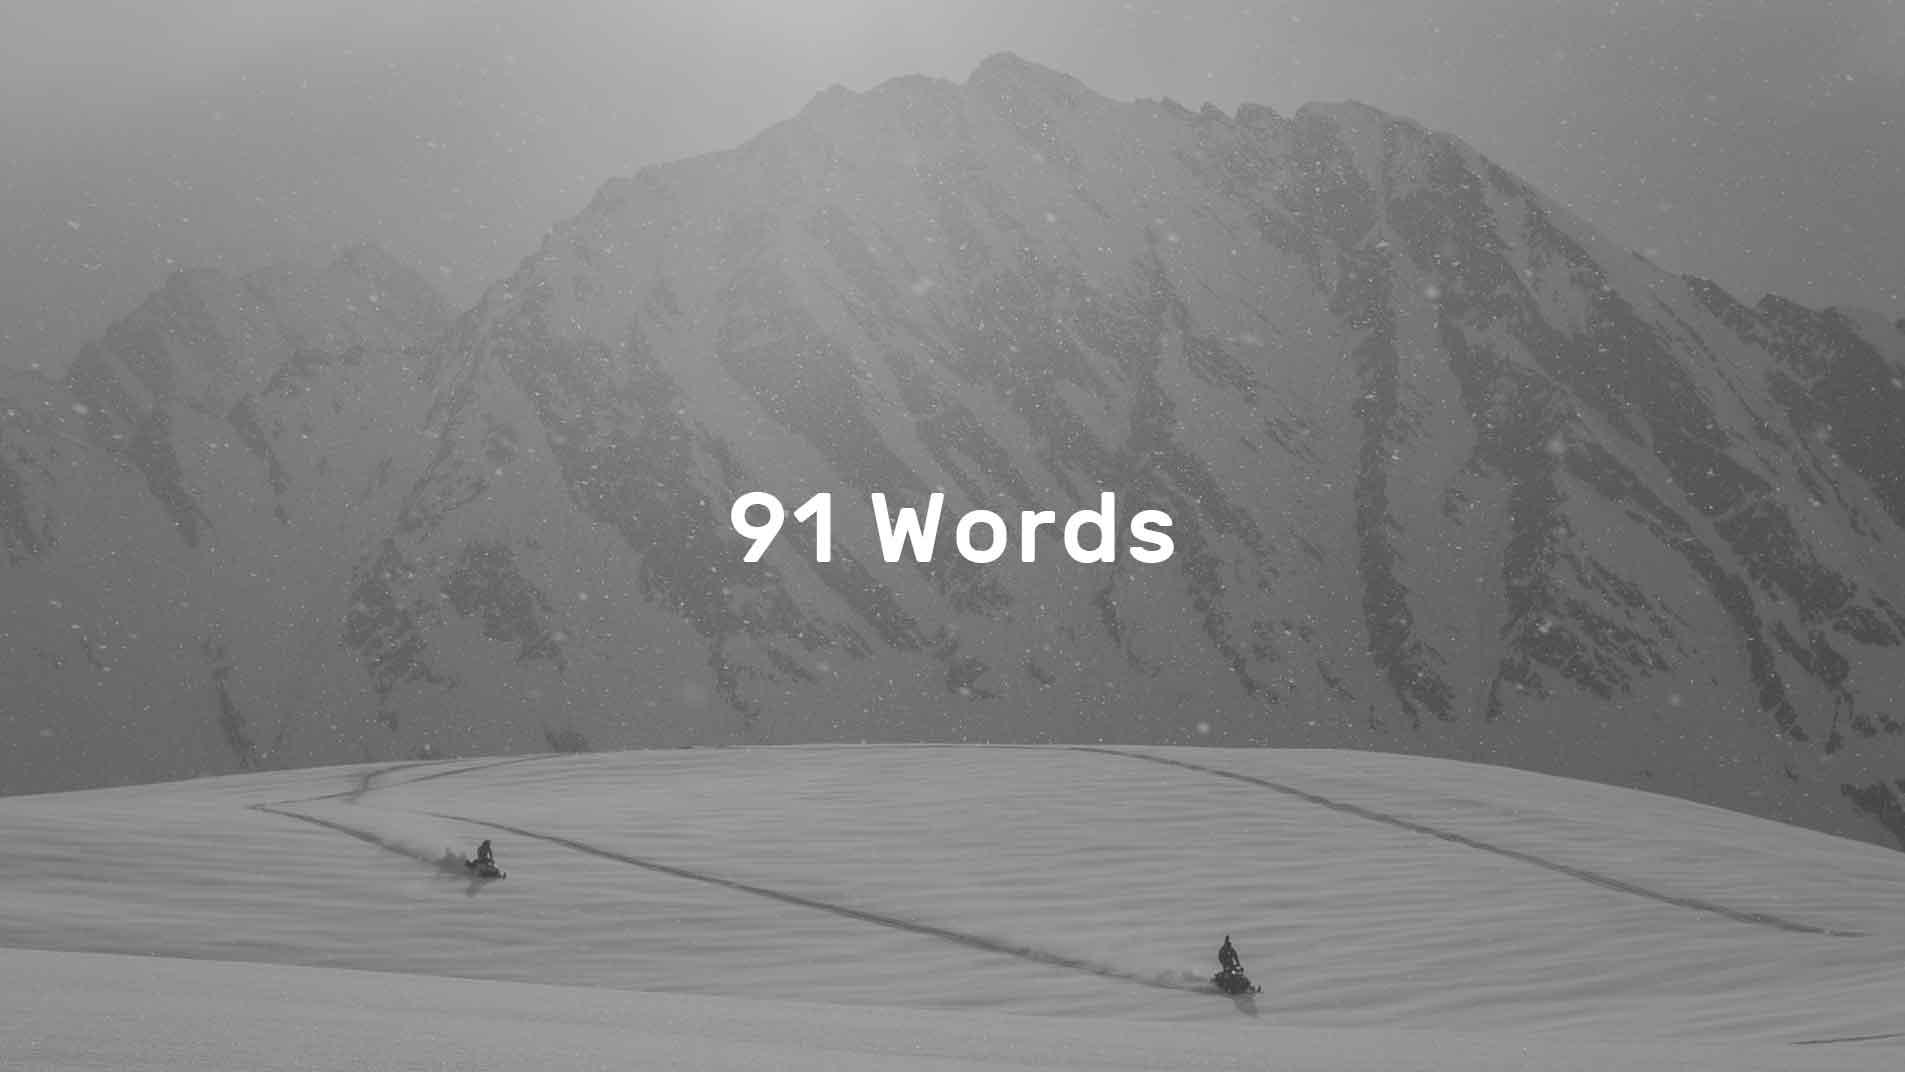 91 Words